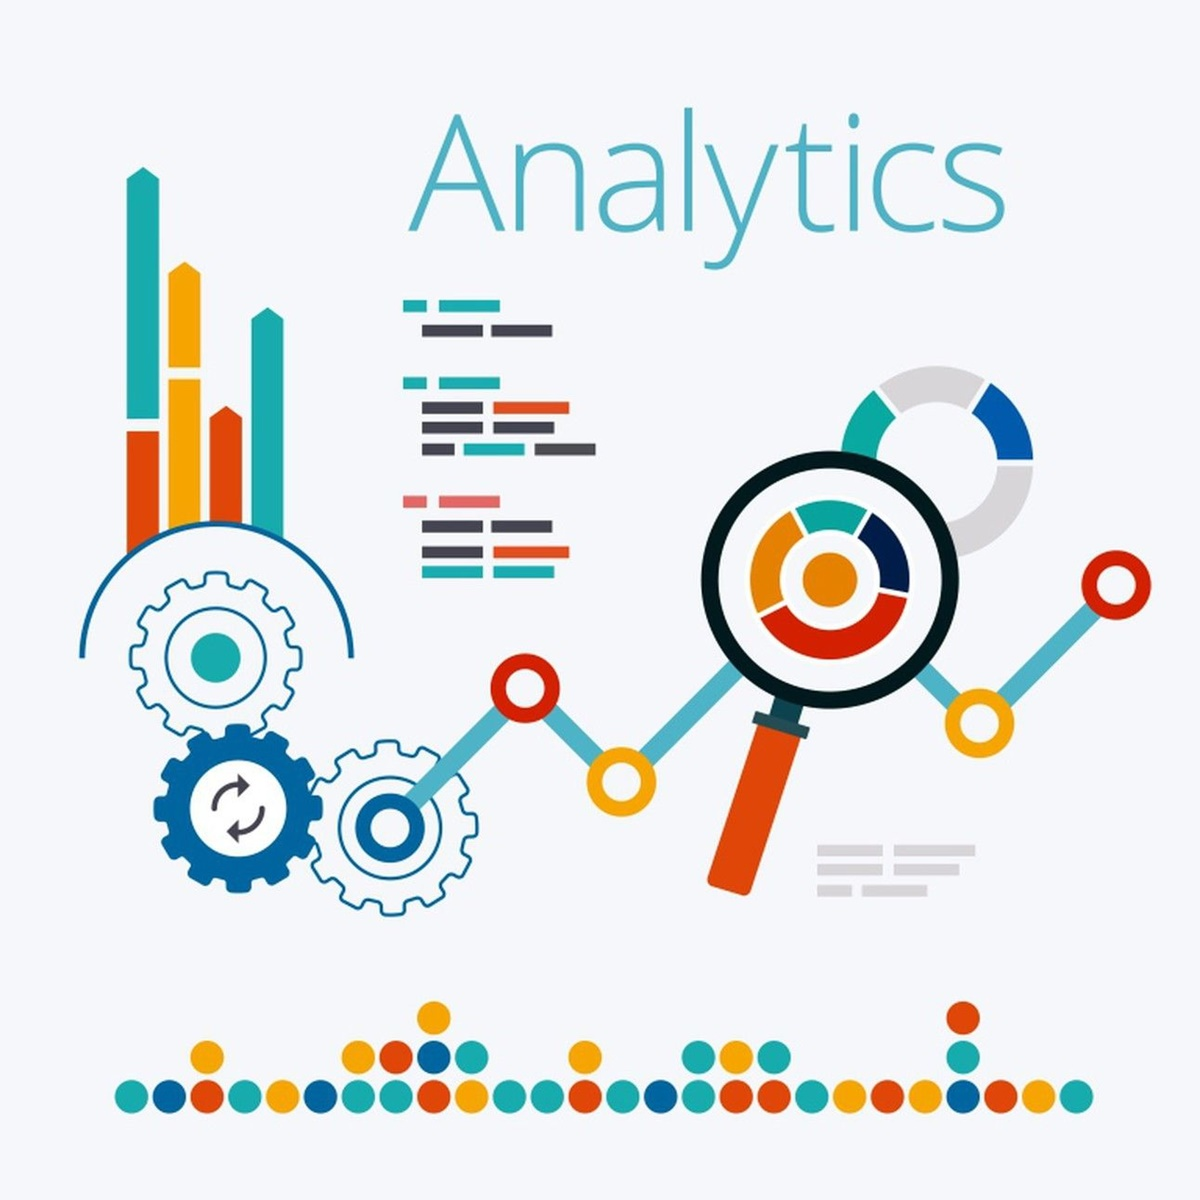 Keep an eye on analytics